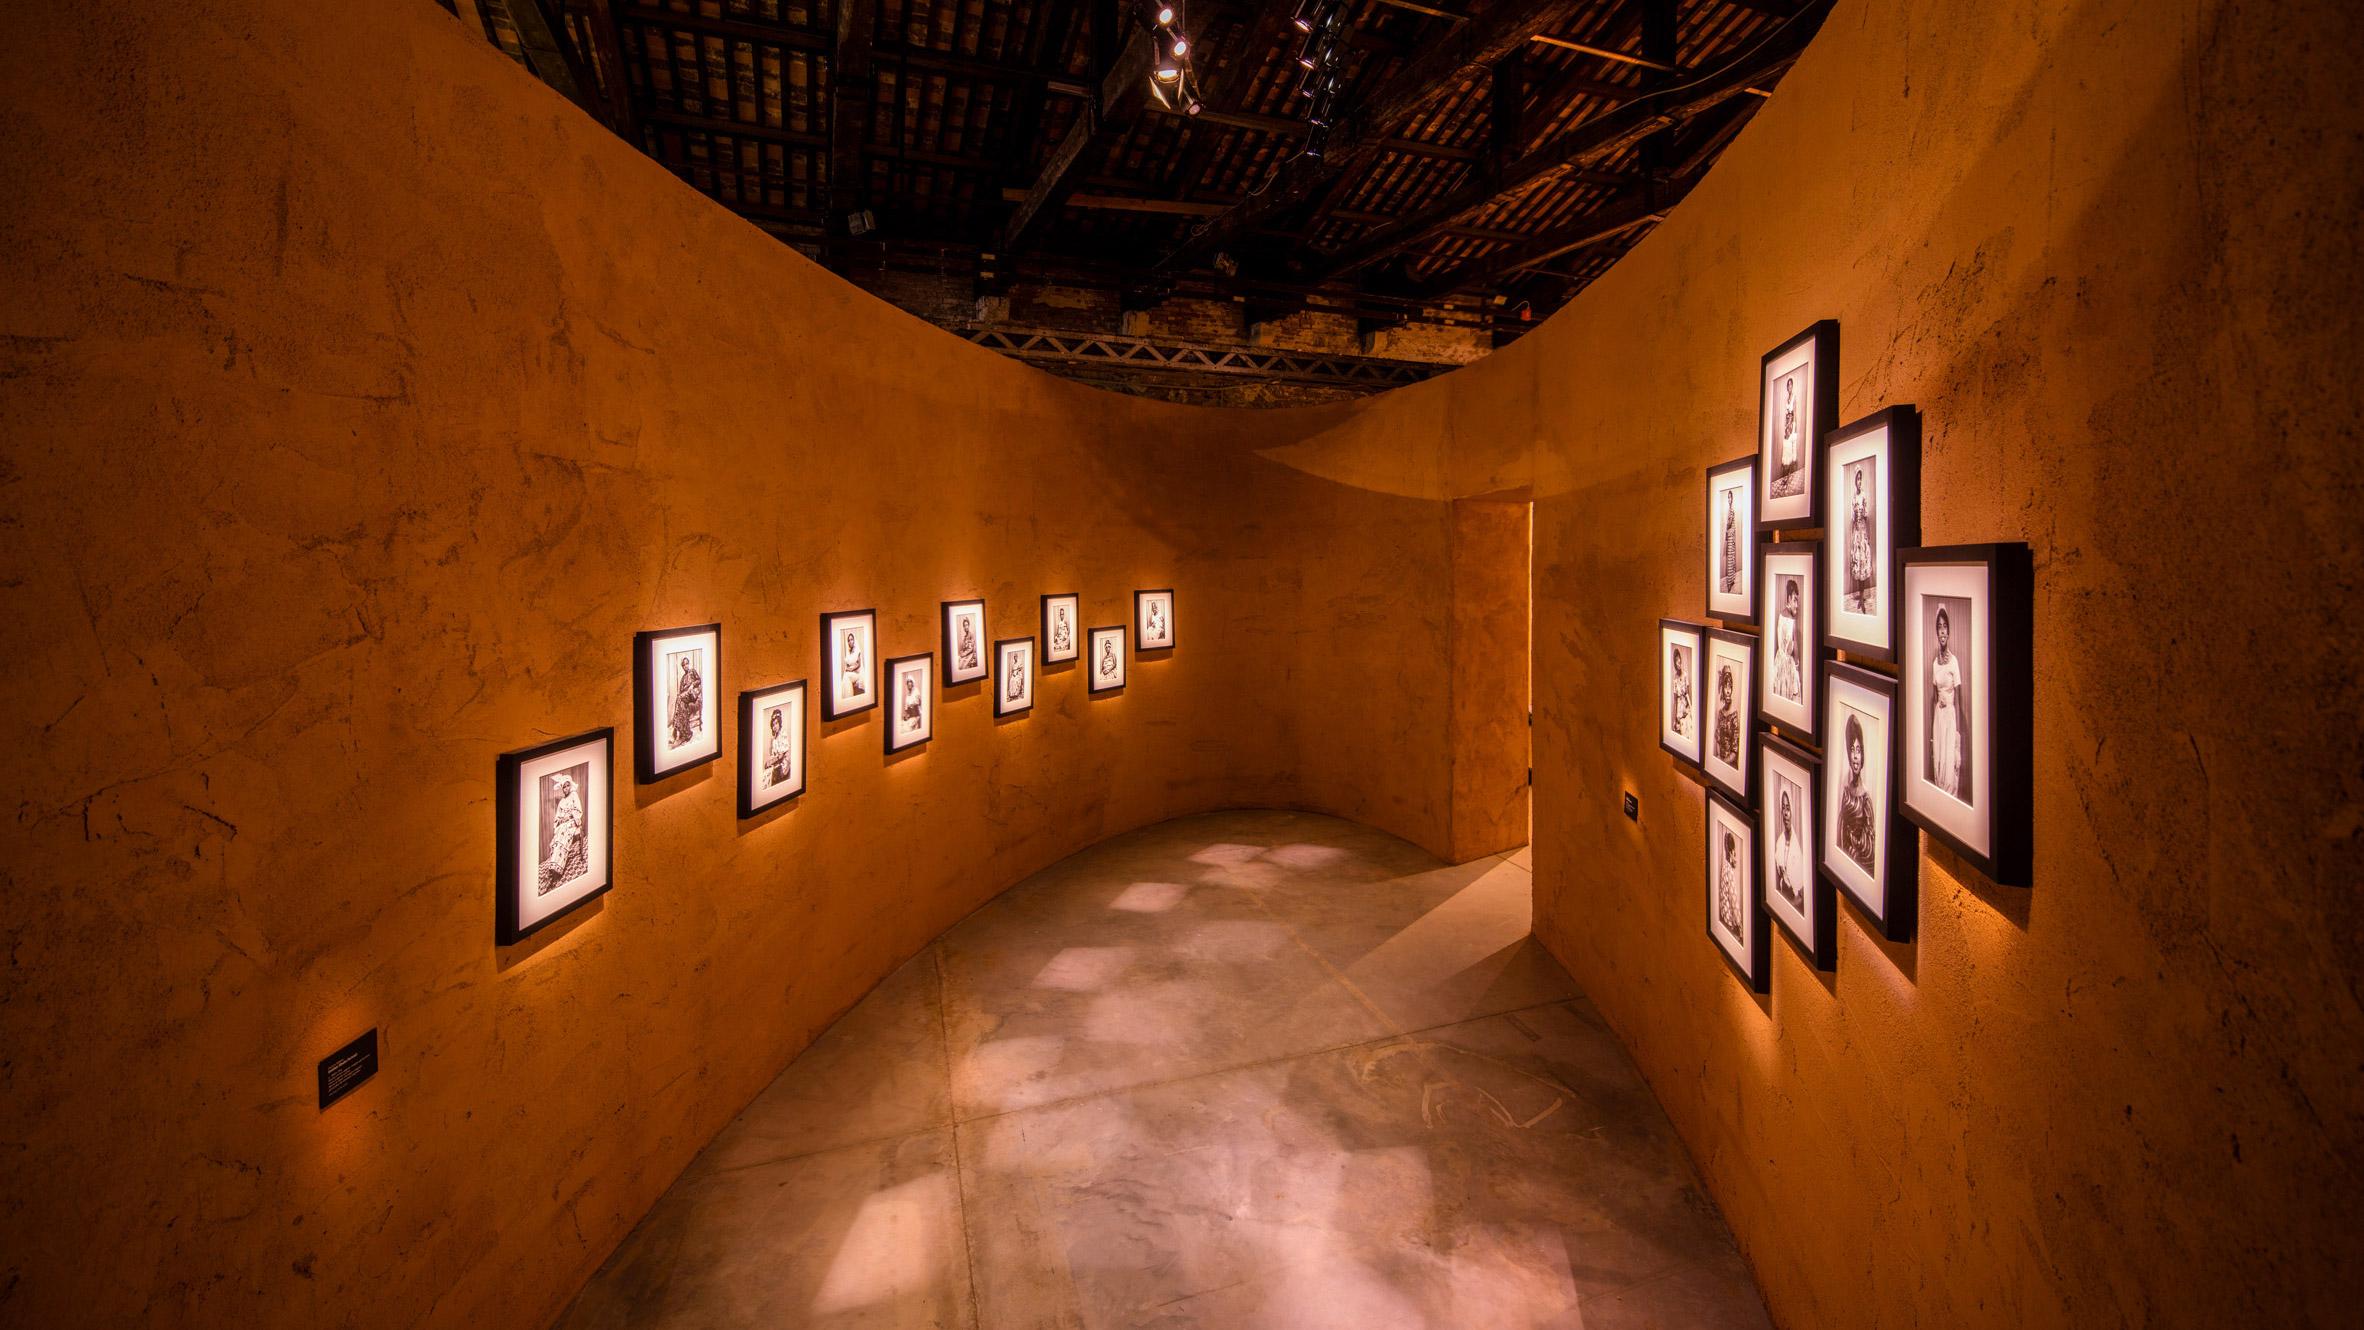 Ghana Freedom by David Adjaye at Venice Art Biennale